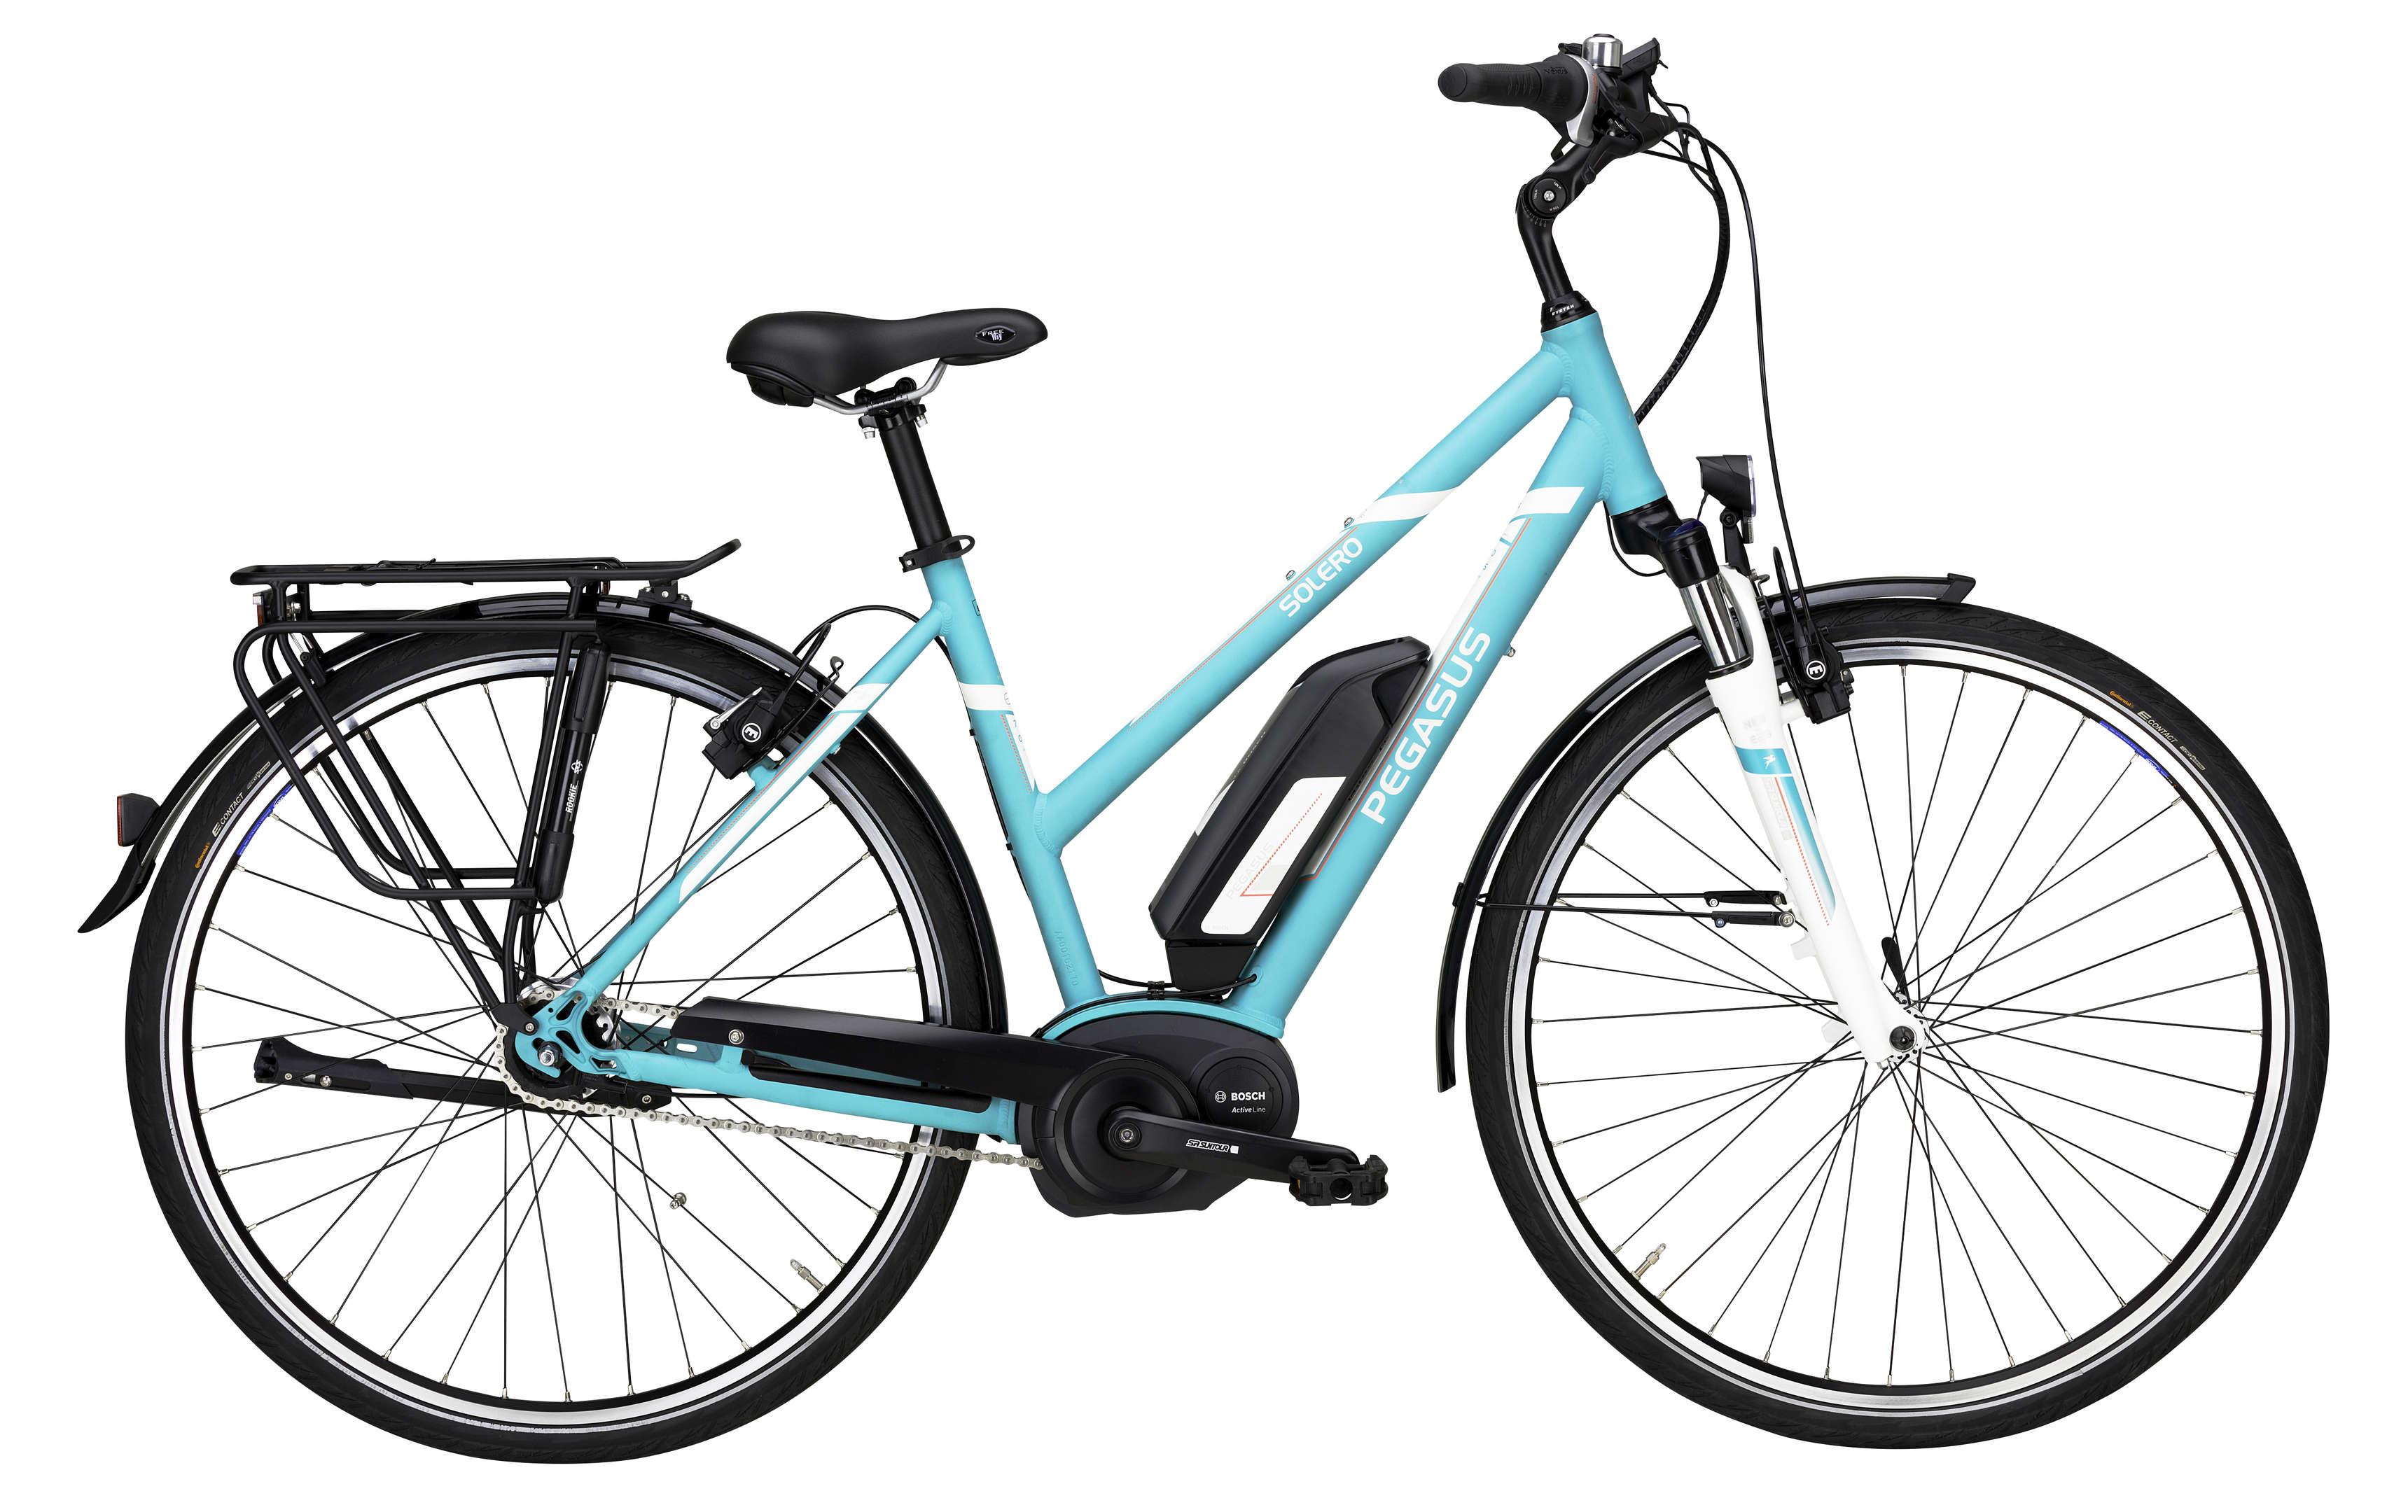 pegasus e bike solero e7r eurorad bikeleasingeurorad. Black Bedroom Furniture Sets. Home Design Ideas